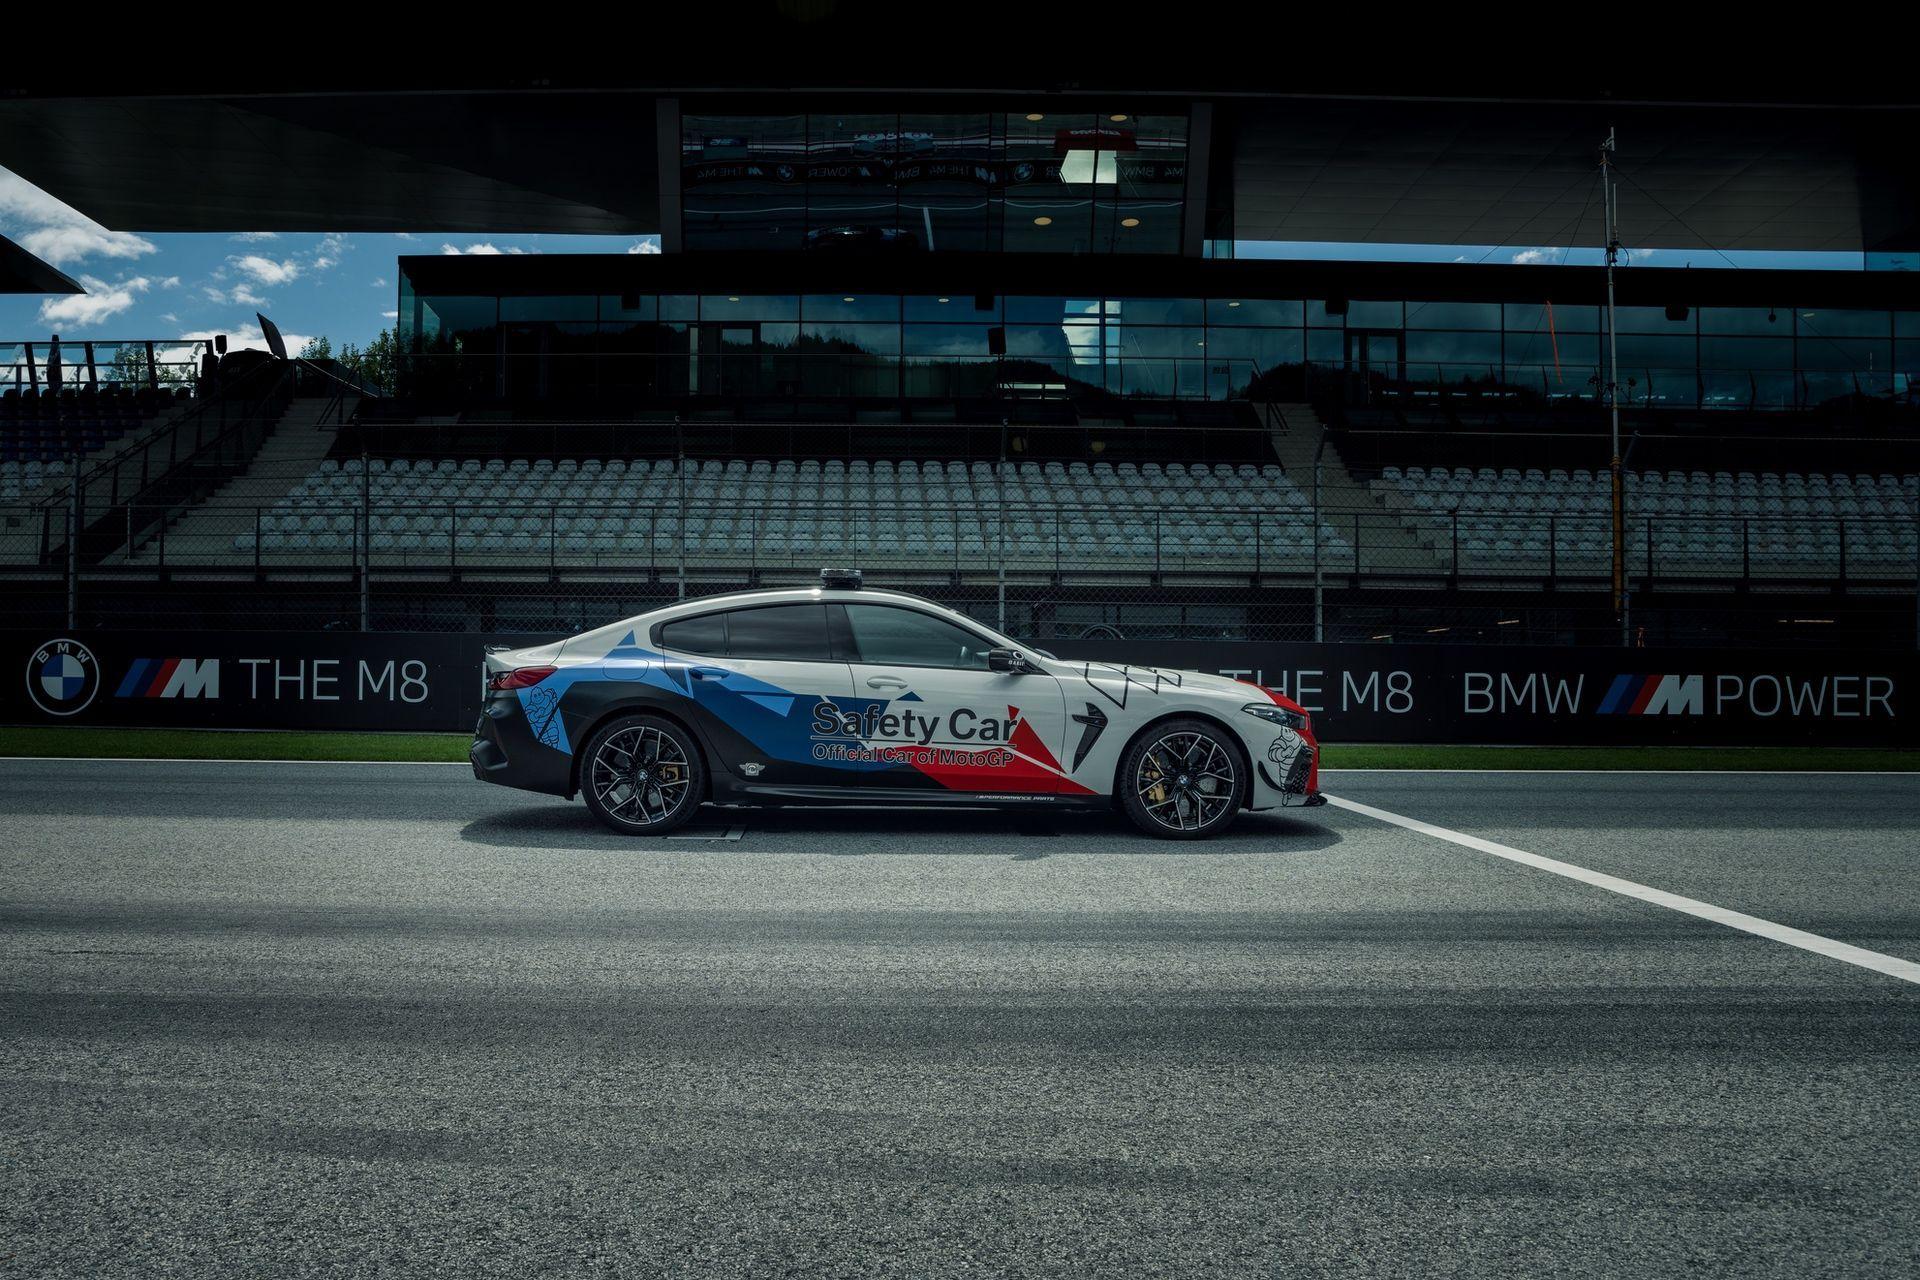 BMW_M8_Gran_Coupe_Safety_Car_MotoGP_0012